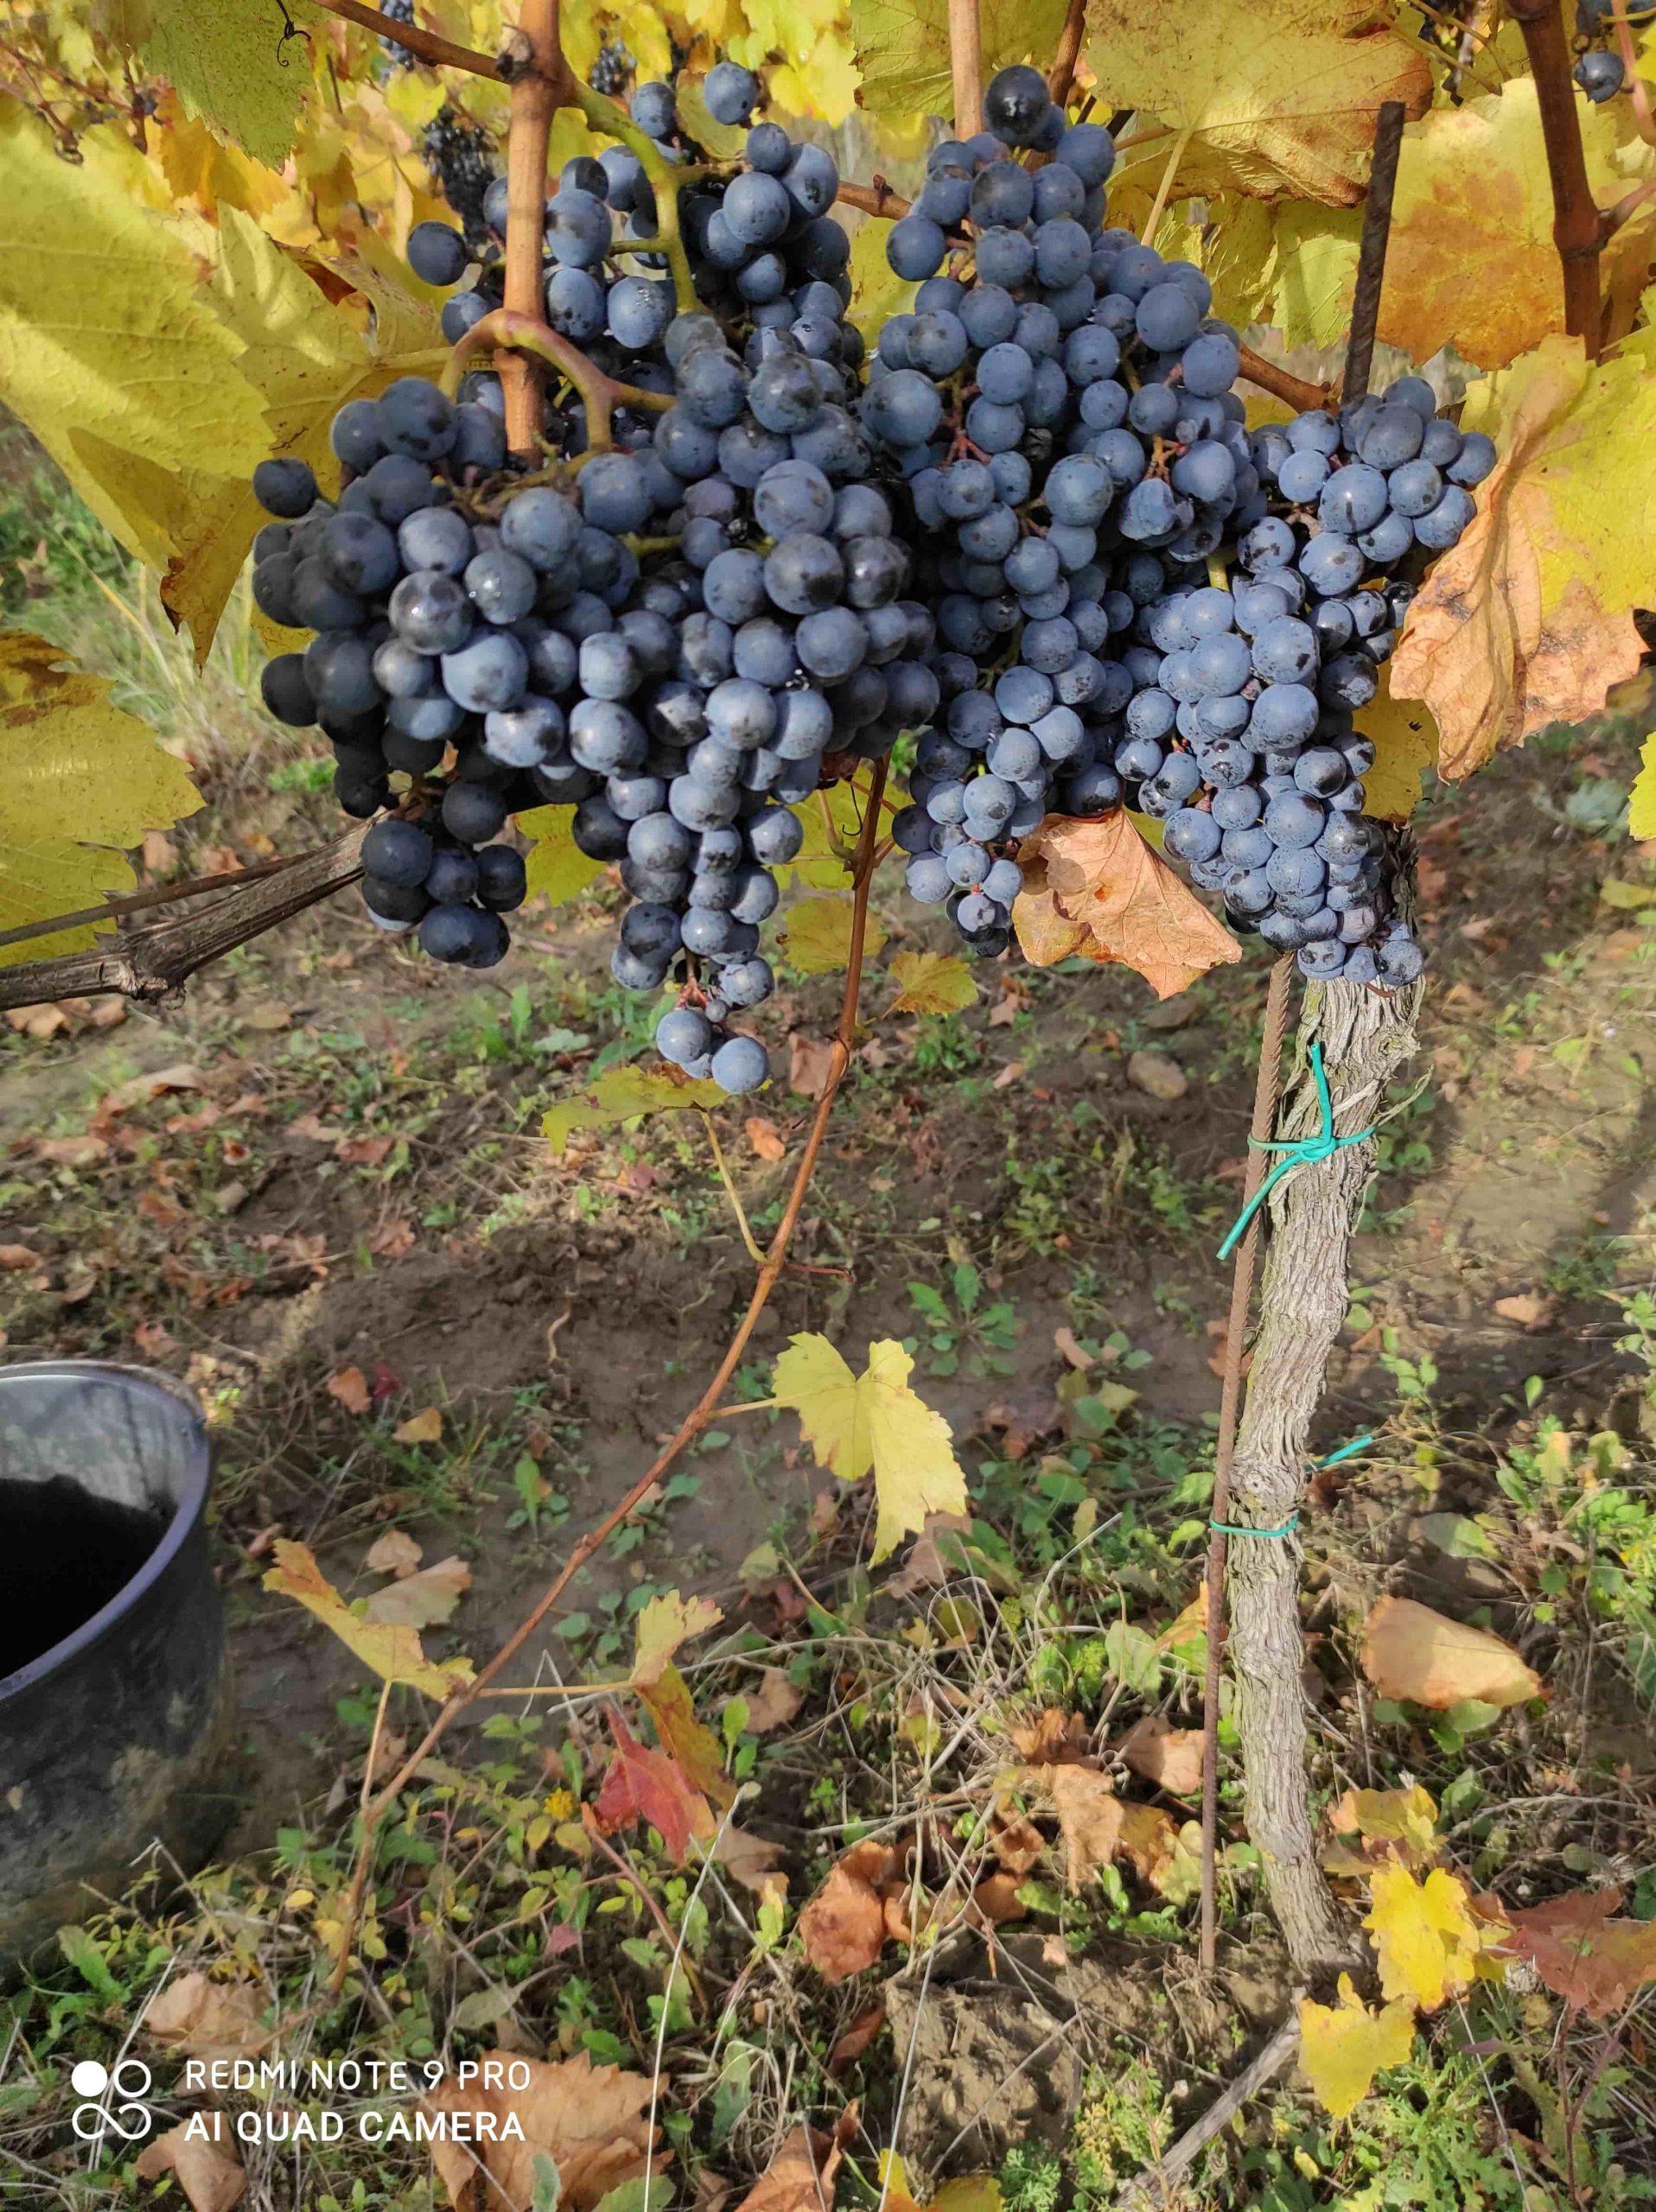 vinohrad8_Vinarstvo Kopecek-min